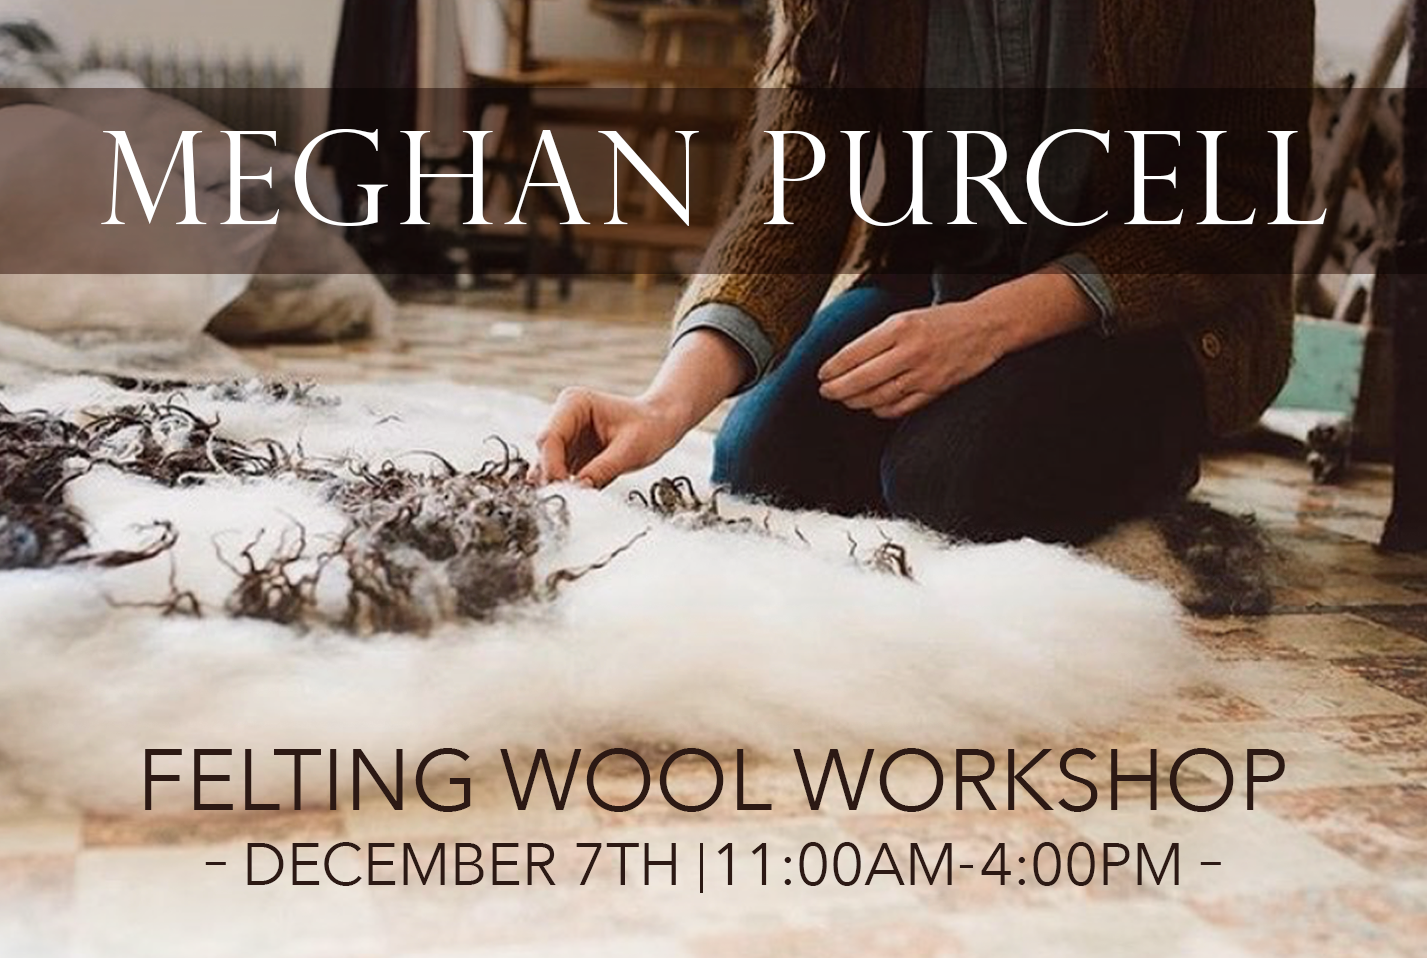 Meghan Purcell - Felting Wool Workshop 2019